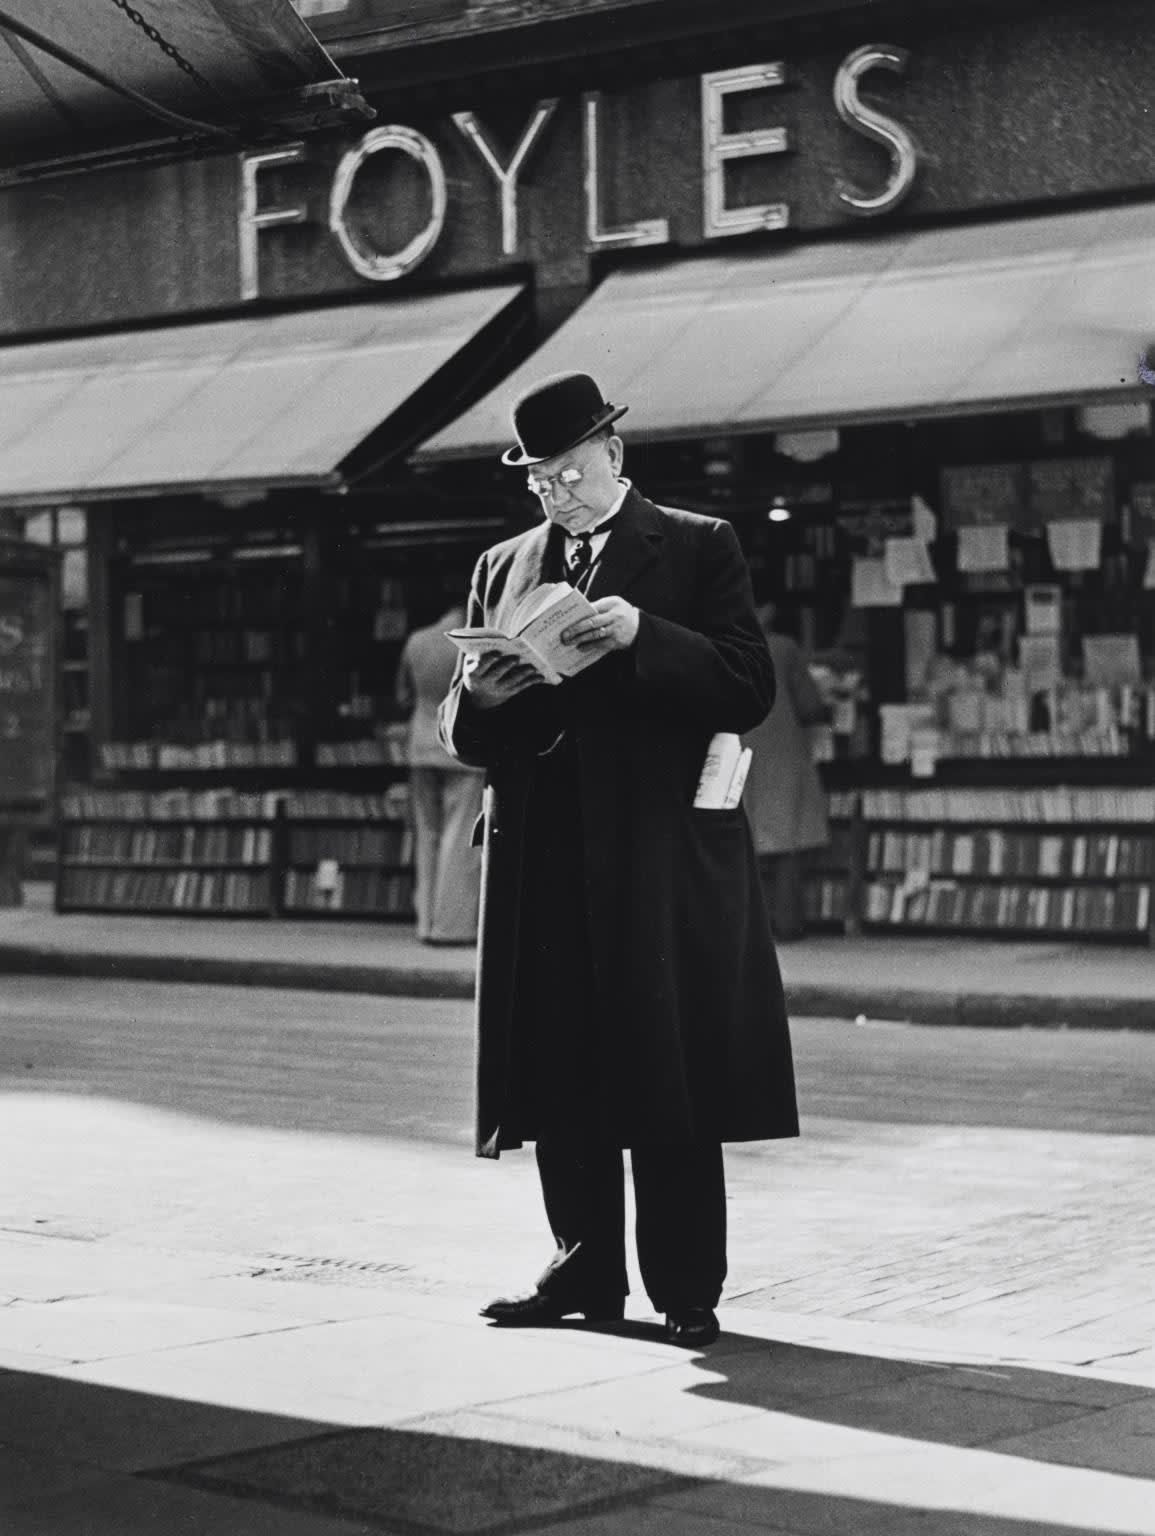 Charing Cross Road (Foyles), c.1936